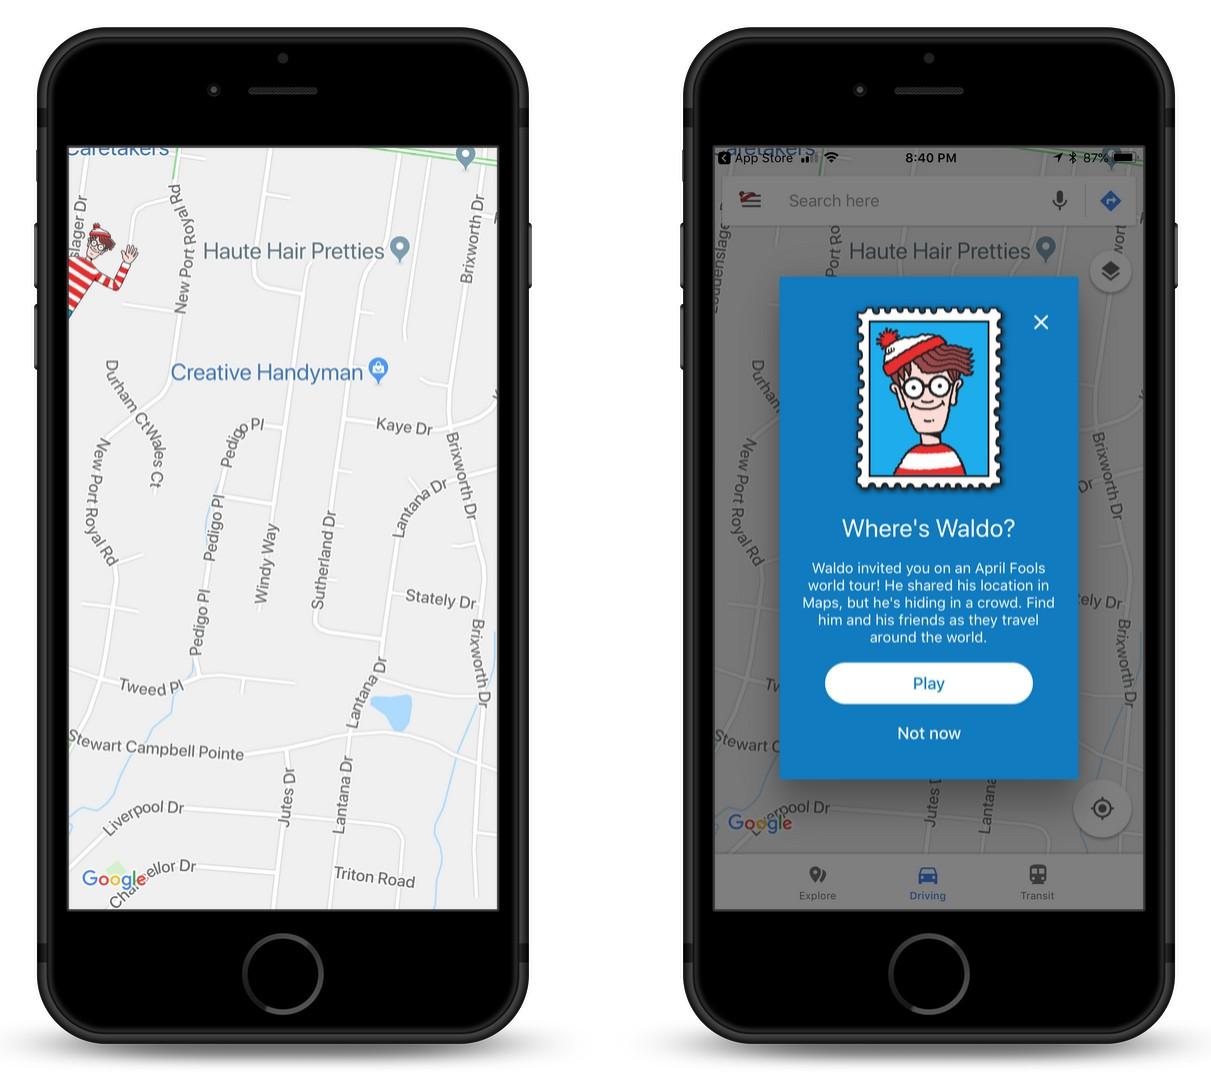 Where's Waldo? He's Hiding in a New Google Maps Mini-Game